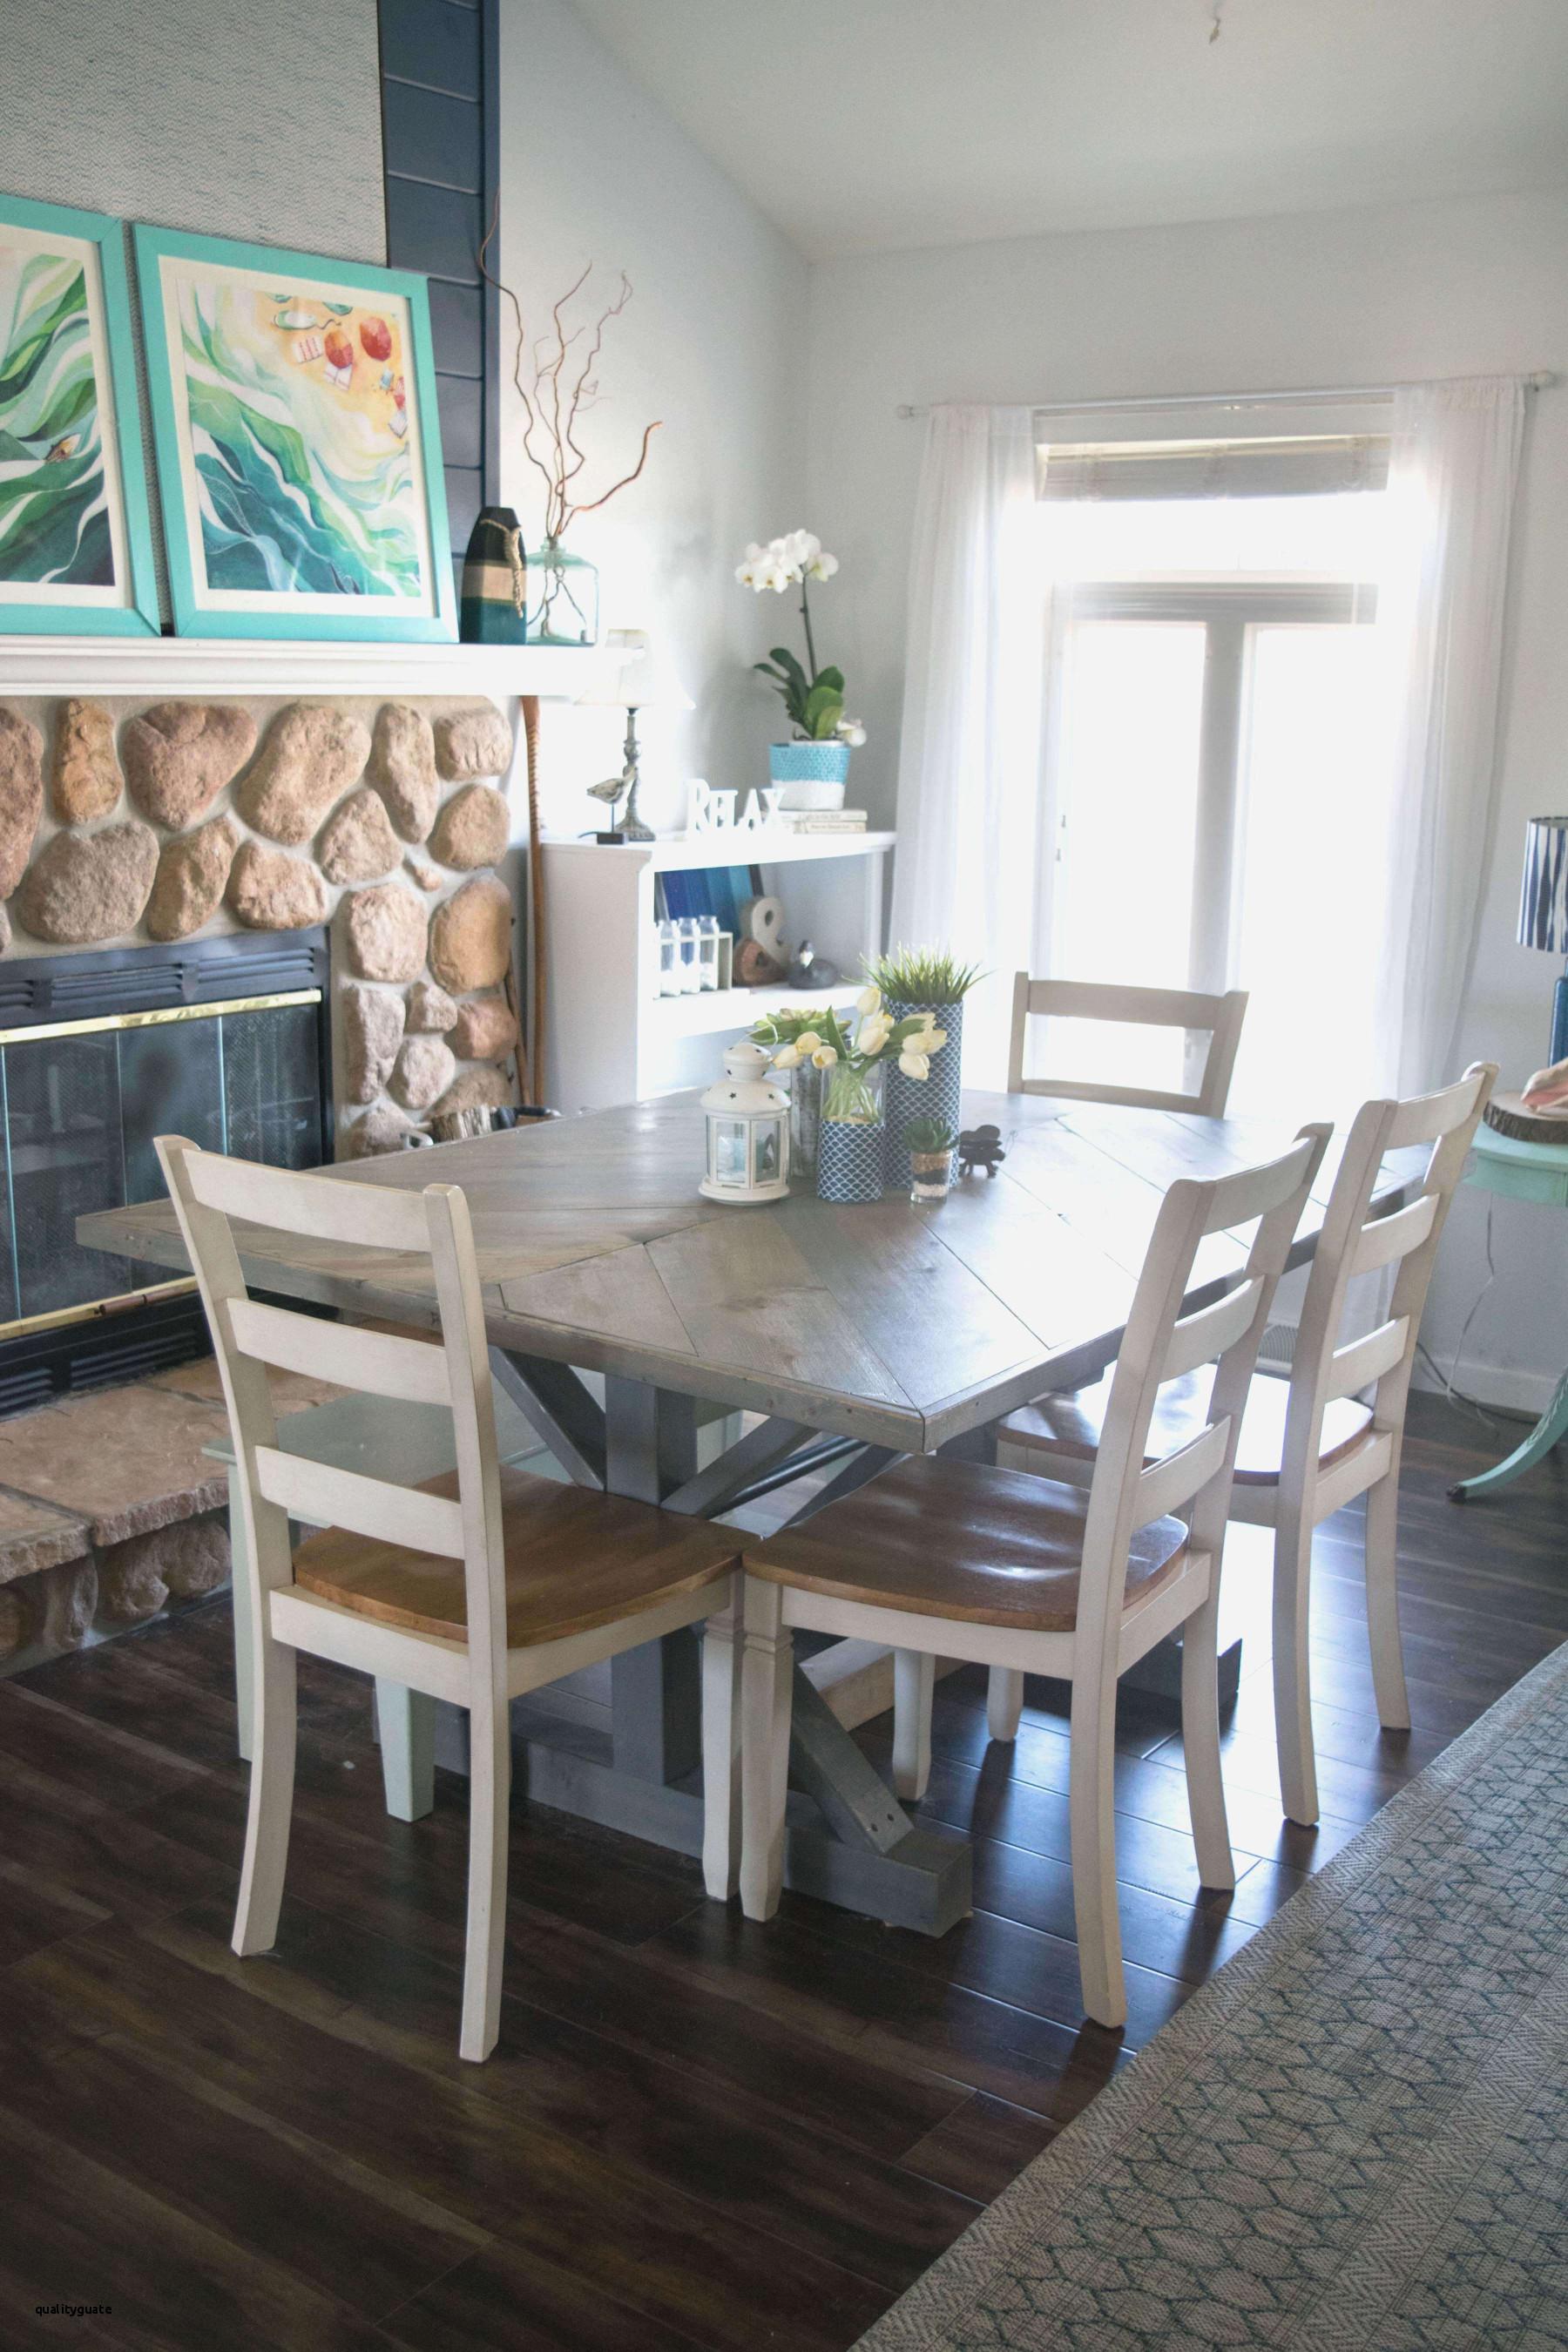 Buy Hardwood Flooring wholesale Of 36 Inspirational Shabby Chic Furniture Cheap Decoration Regarding Shabby Chic Bedroom Ideas Lovely Decor Chic Decor Chic Decor 0d Decors Design Ideas Shabby